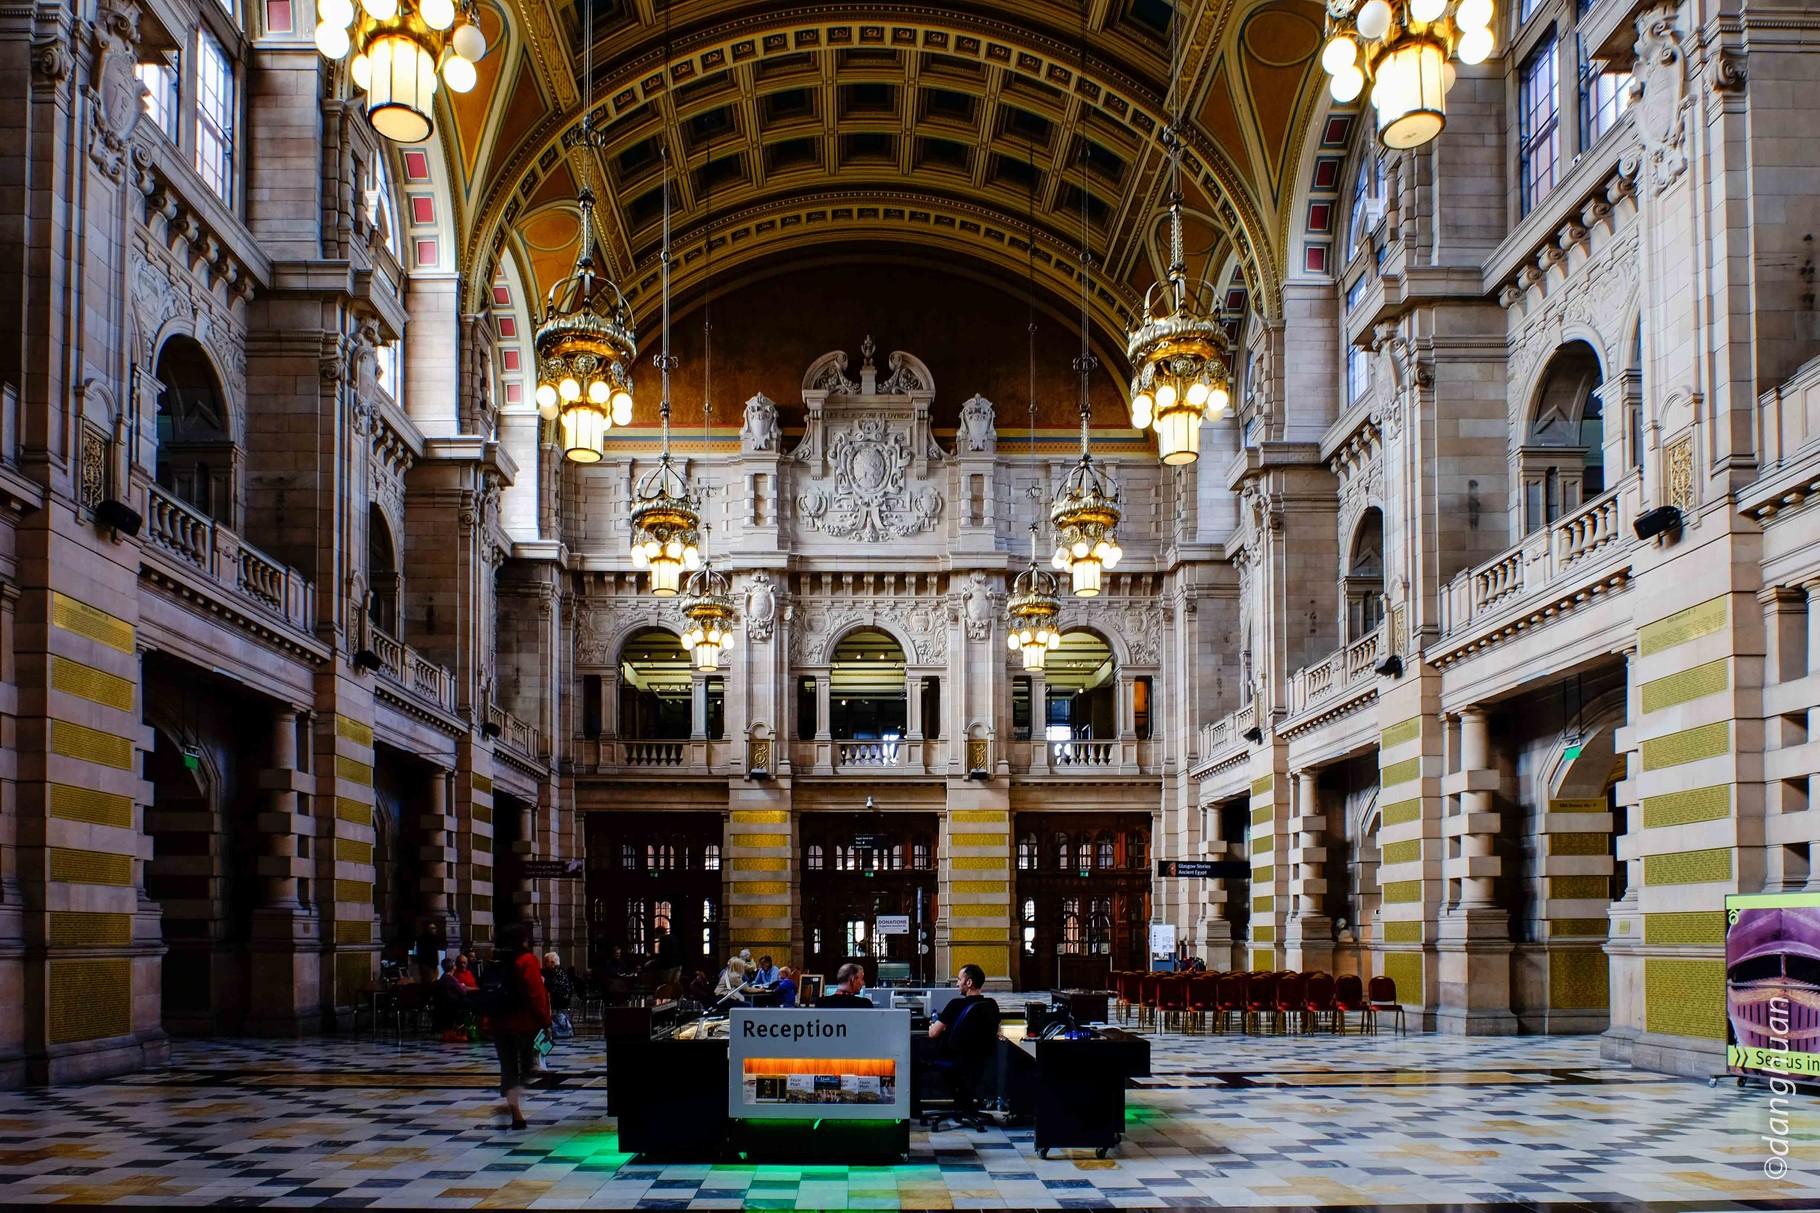 Kelvingrove Art Gallery de Glasgow